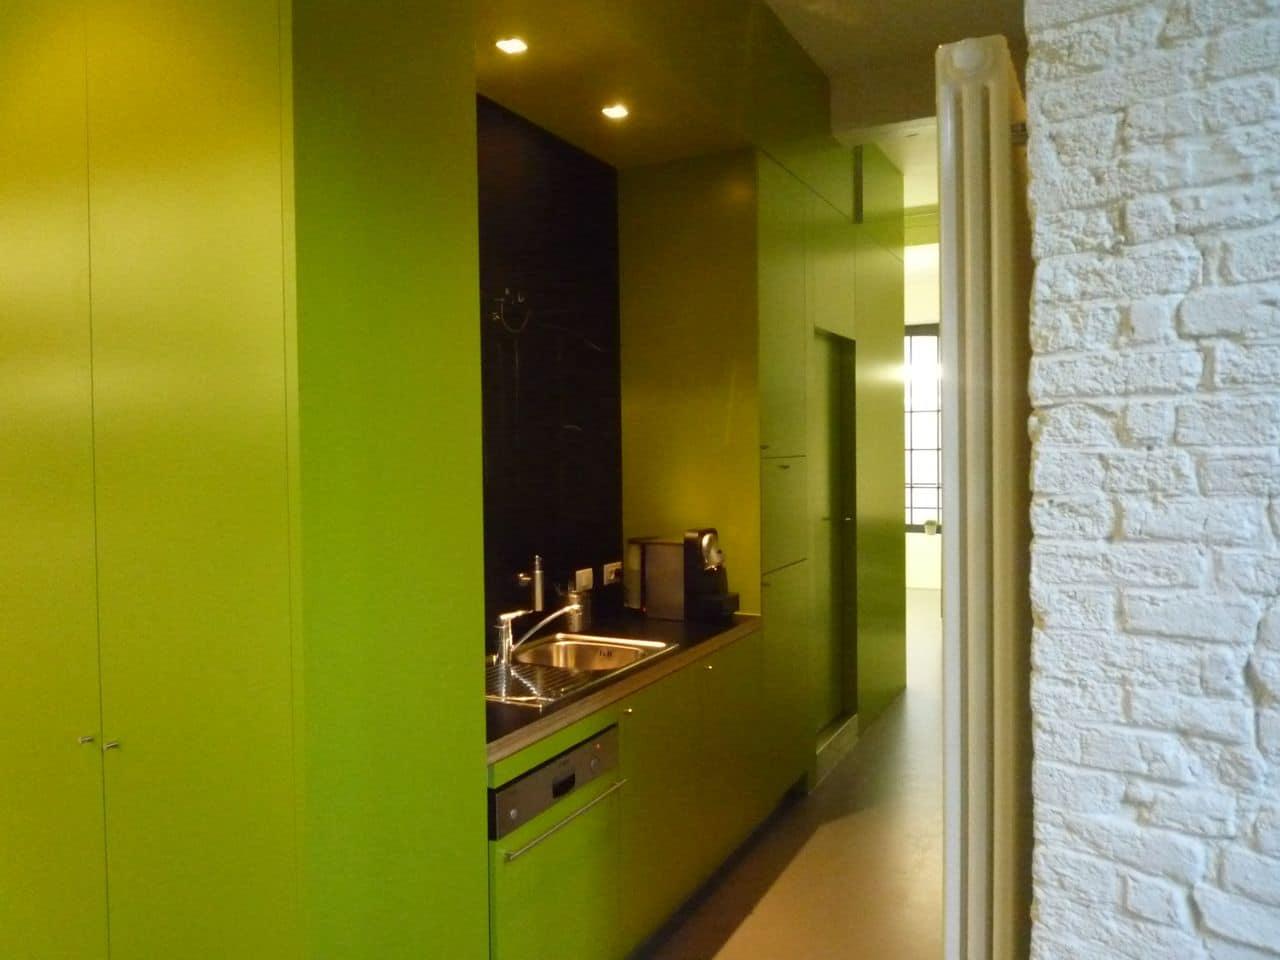 P1060714 | Baeyens & Beck architecten Gent | architect nieuwbouw renovatie interieur | high end | architectenbureau